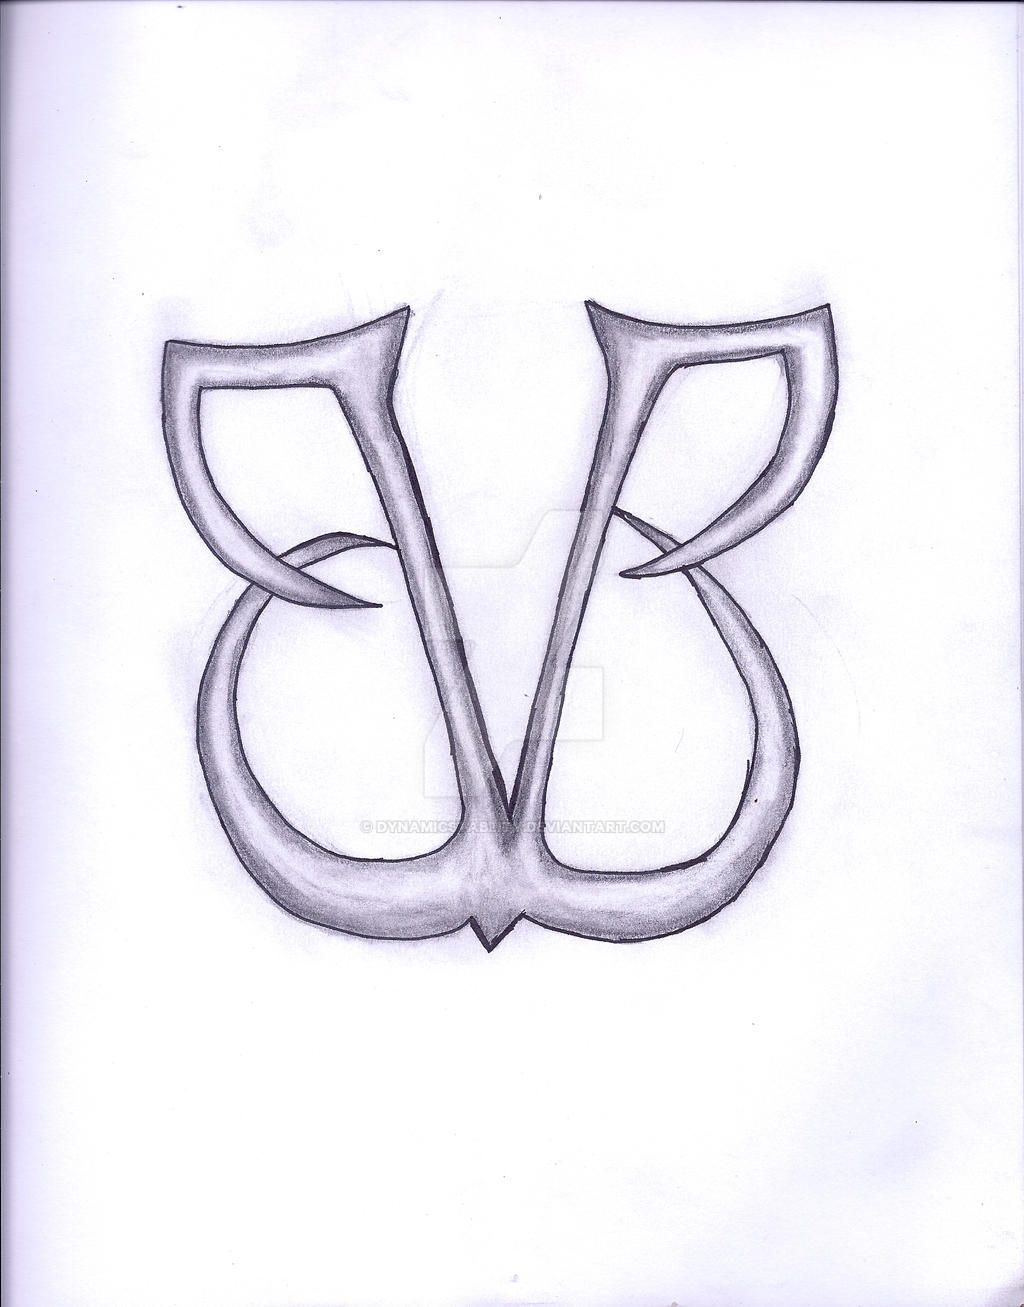 BVB Symbol by DynamicStablity on DeviantArt